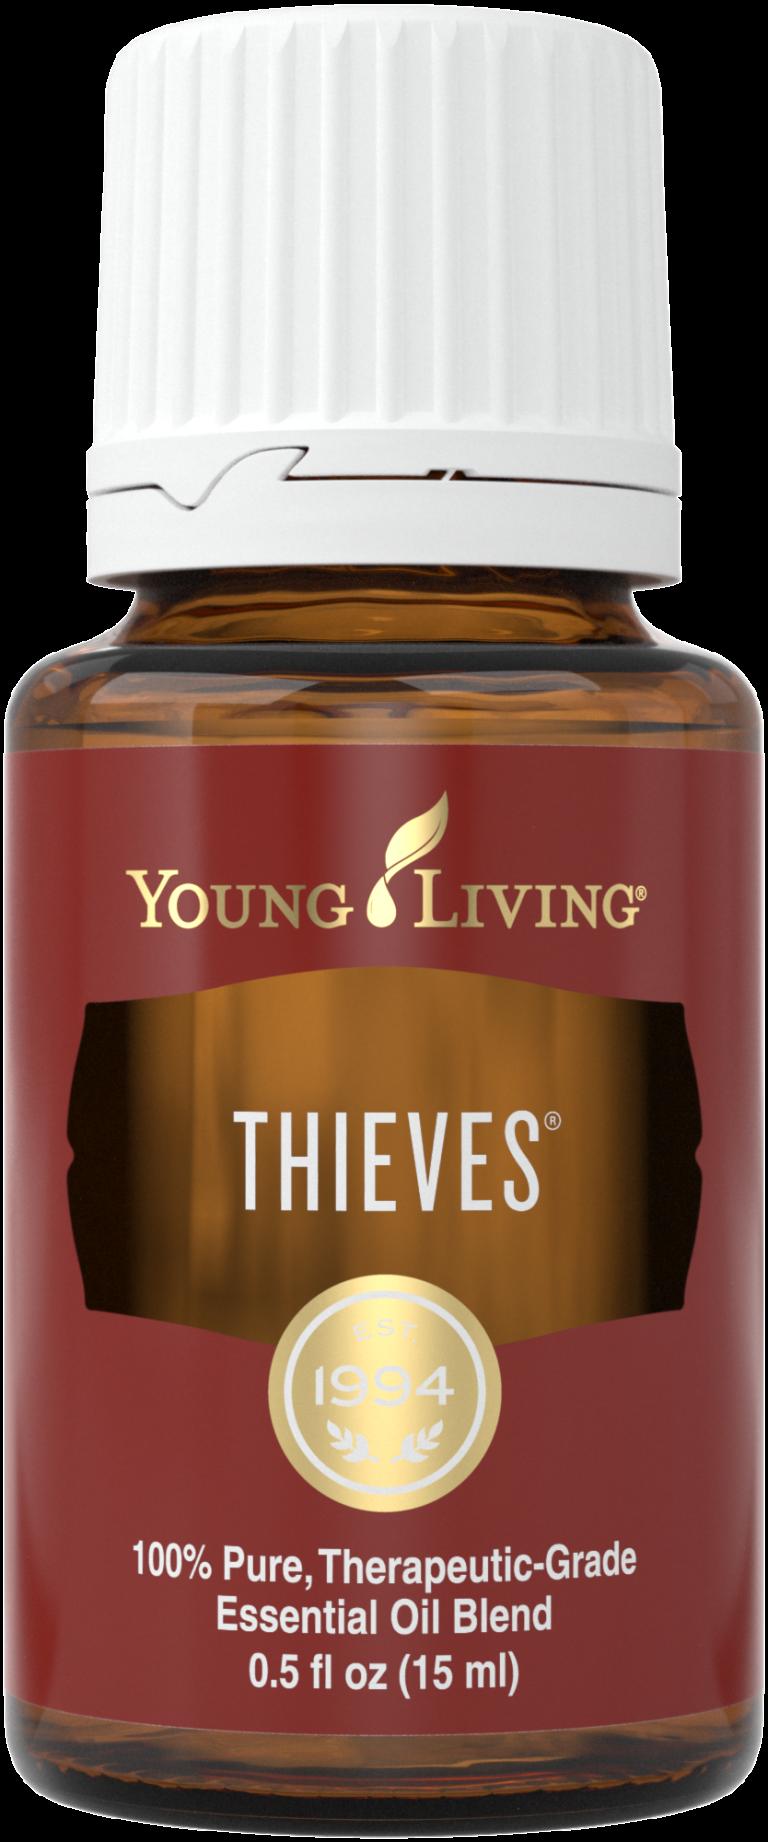 thieves_15ml_silo_us_2016_23899000964_o